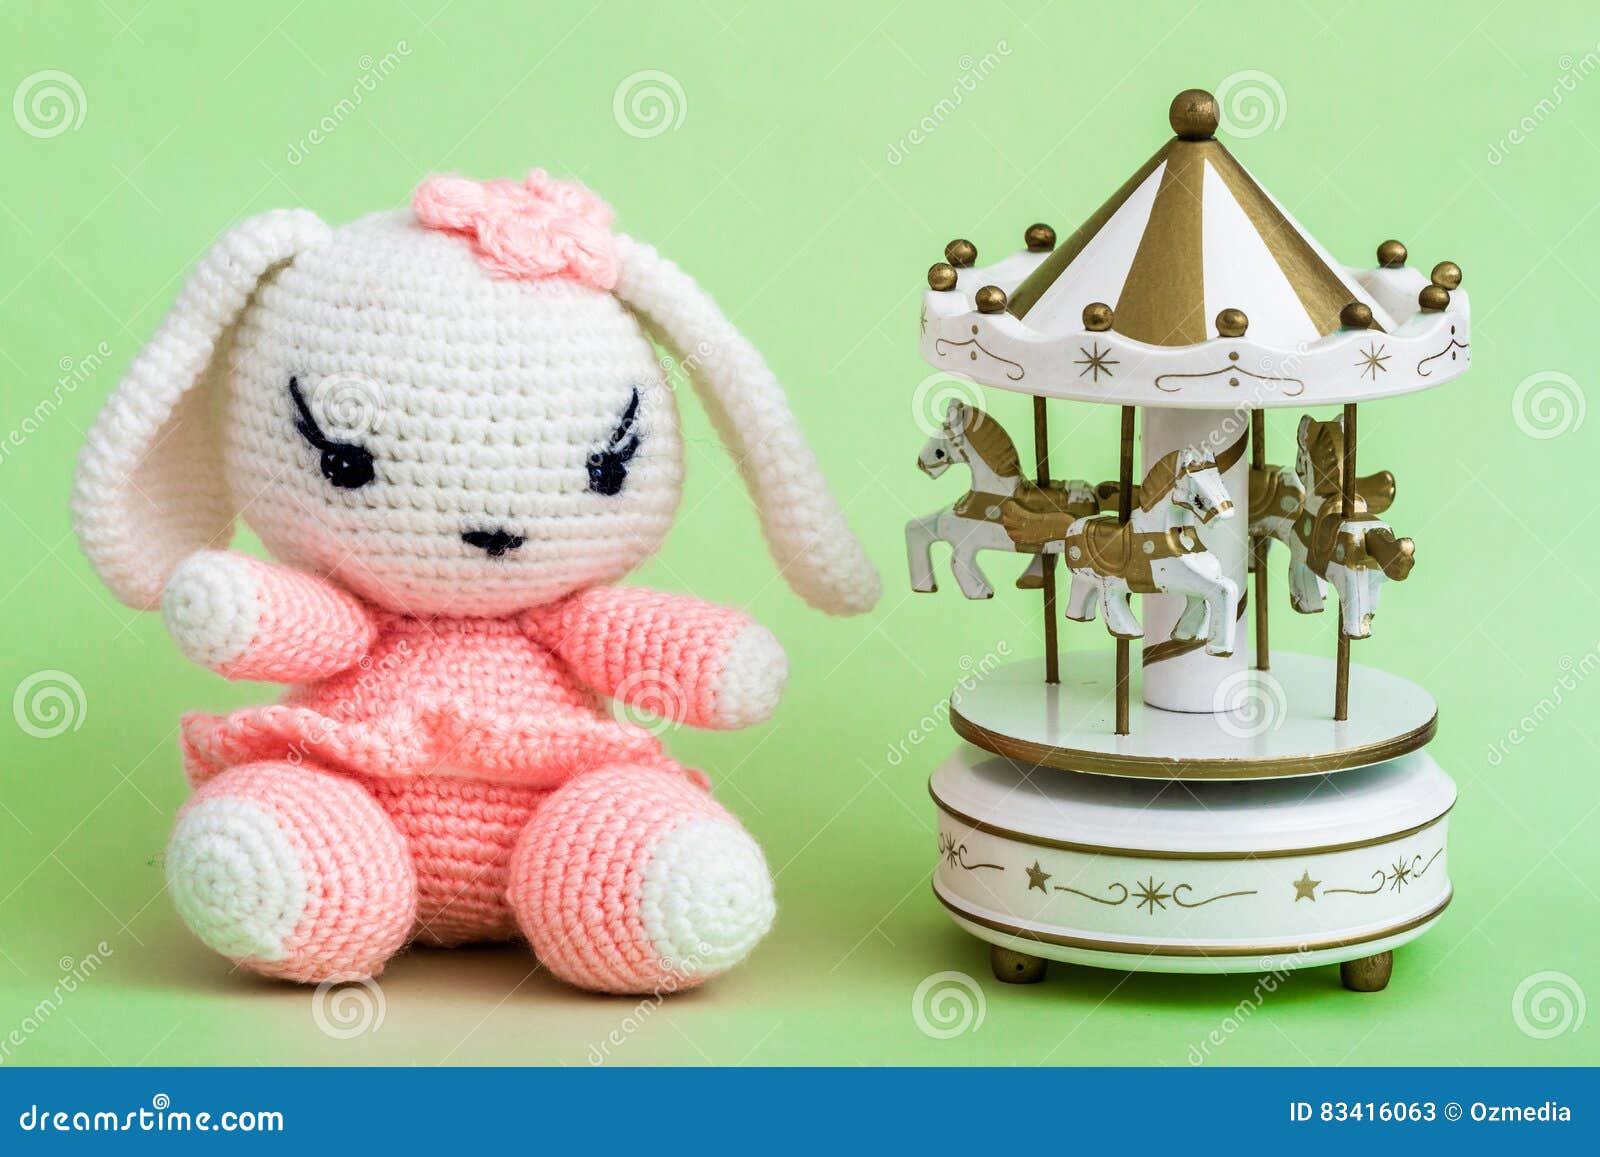 Crochet Doll Toys Free Patterns | 957x1300